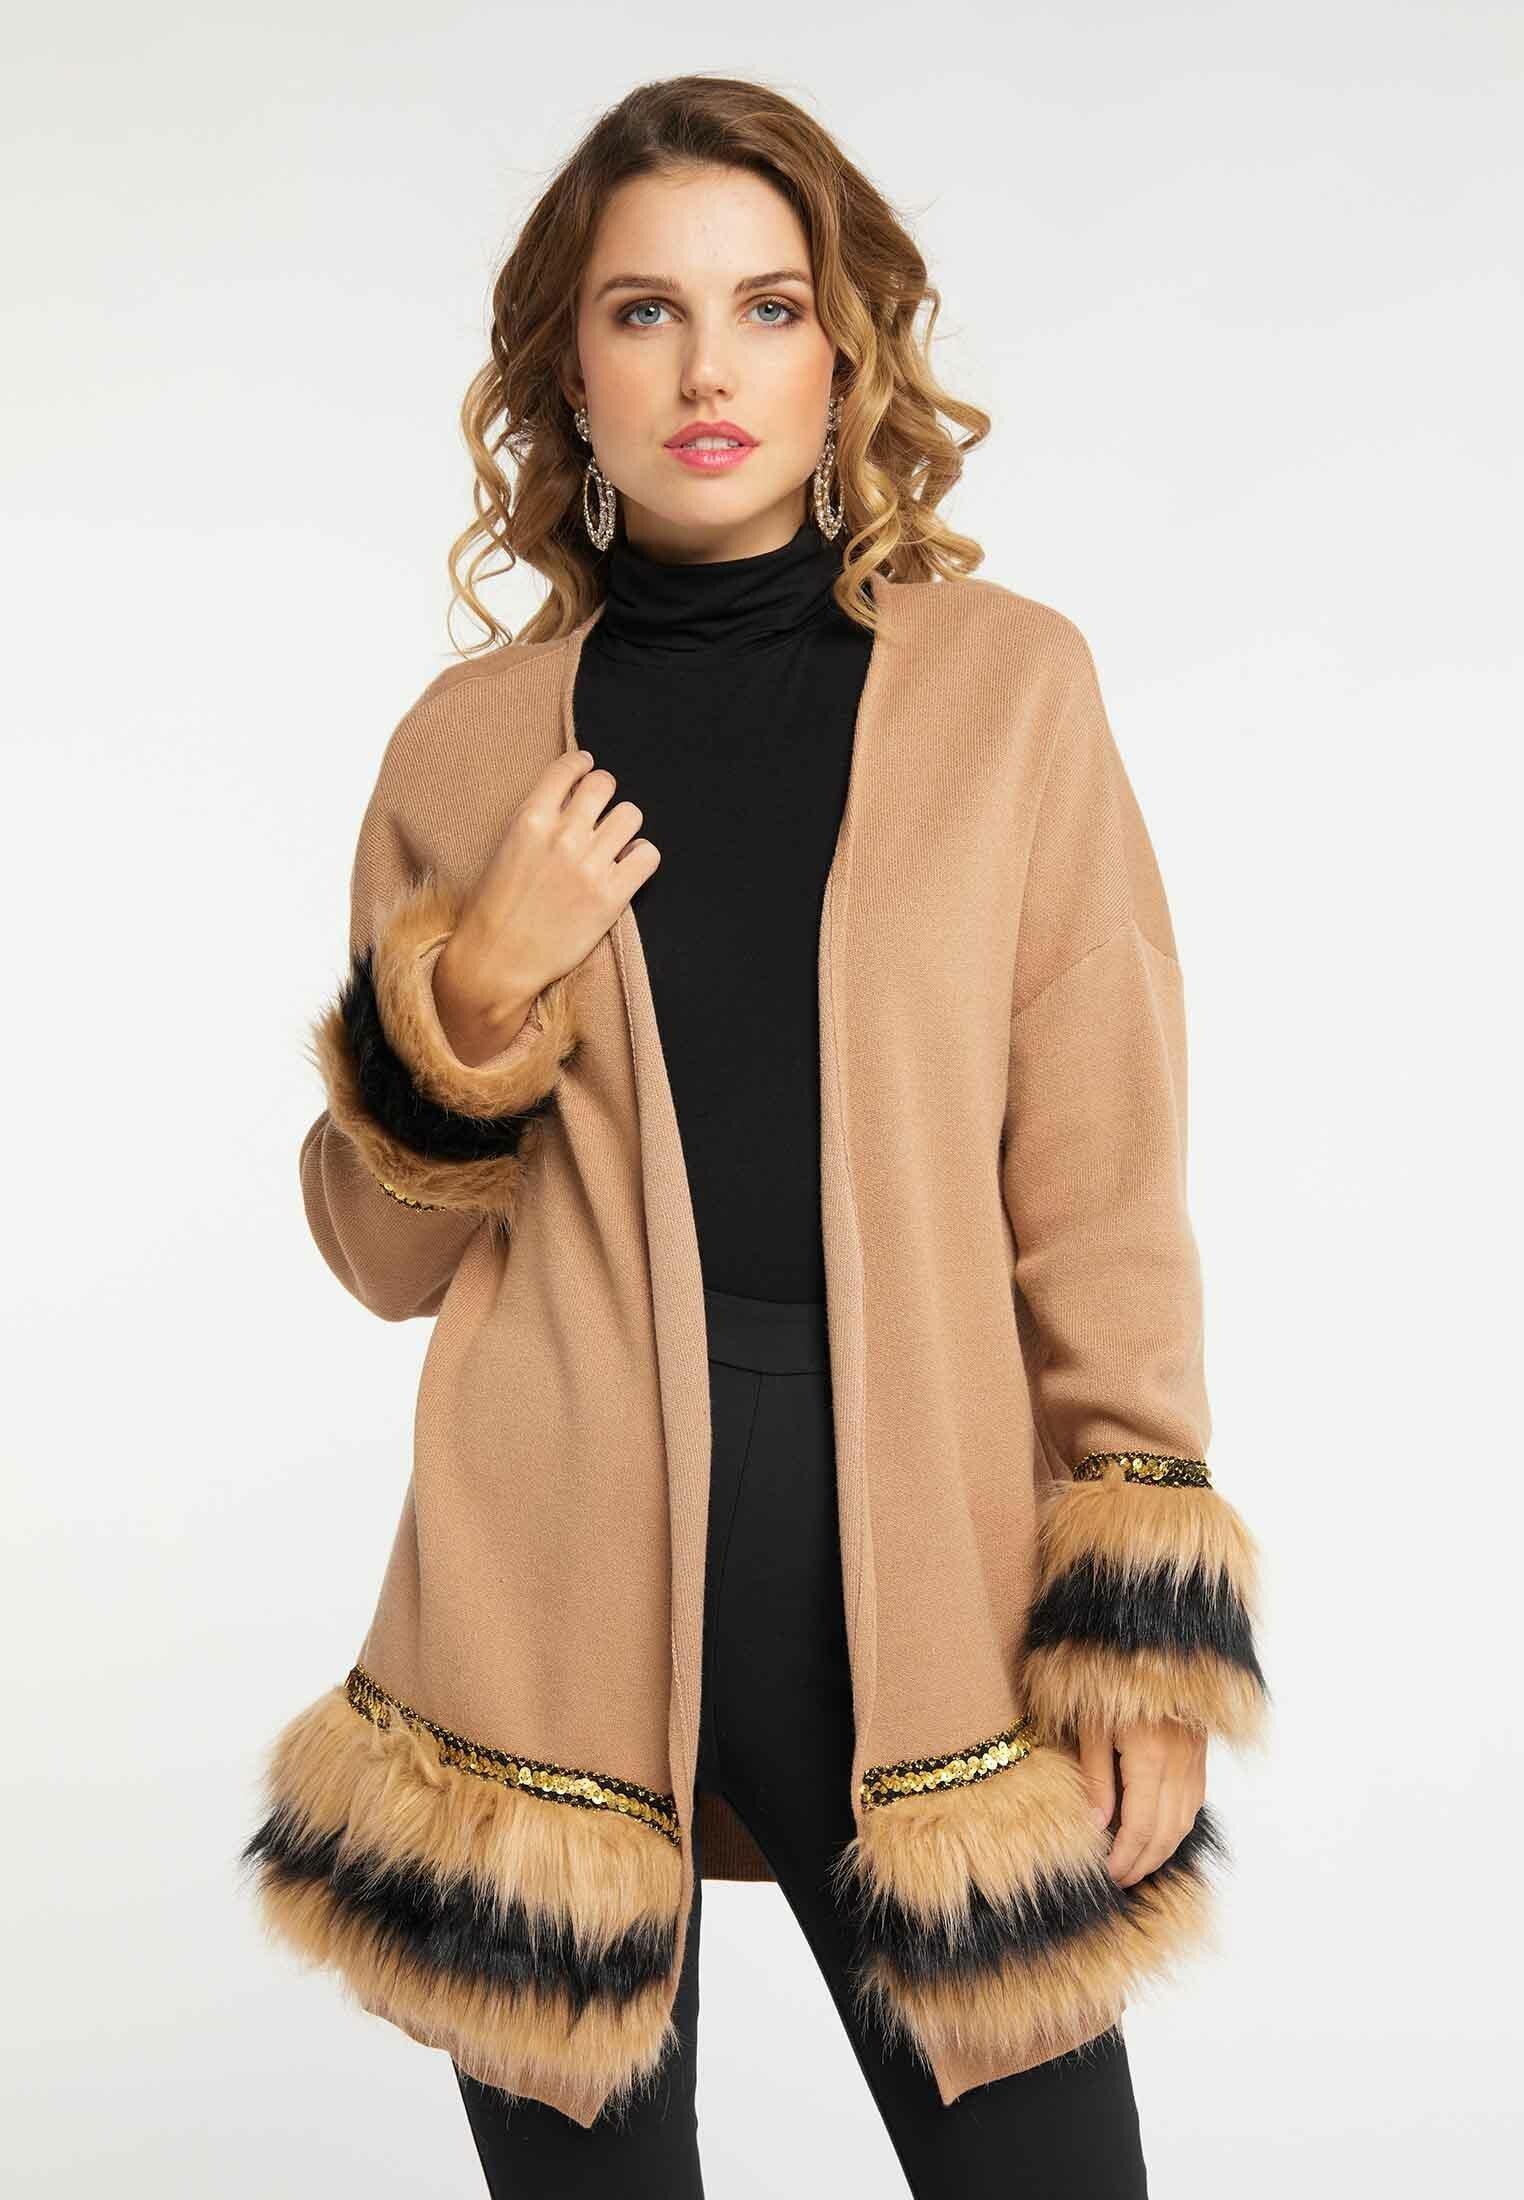 Cool Women's Clothing faina Cardigan brown SHpGU0H3y